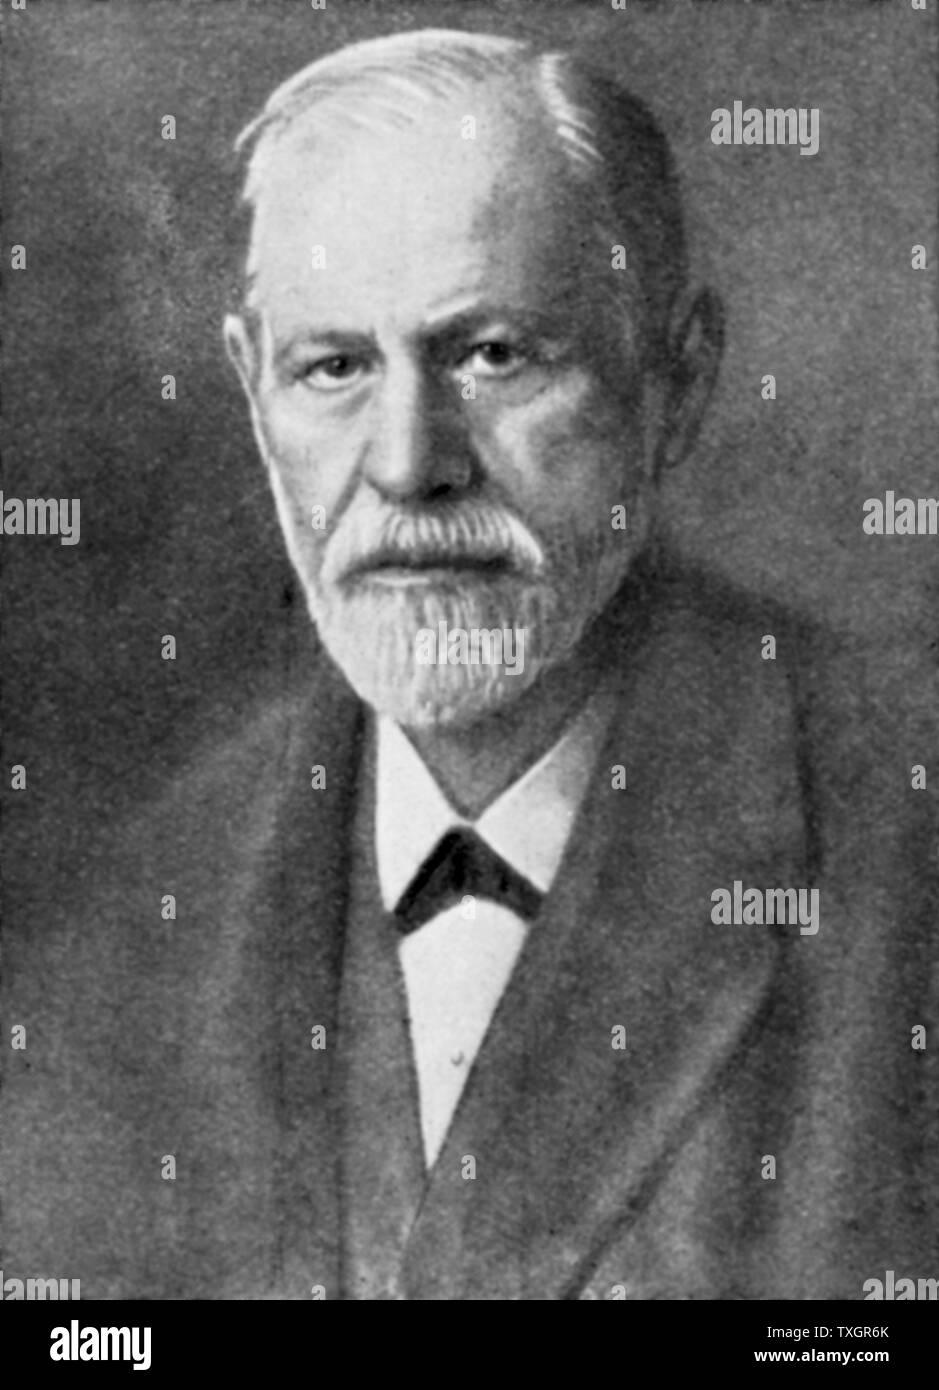 Portrait of Sigmund Freud, Austrian neurologist, ounder of Psychoanalysis 20th century - Stock Image